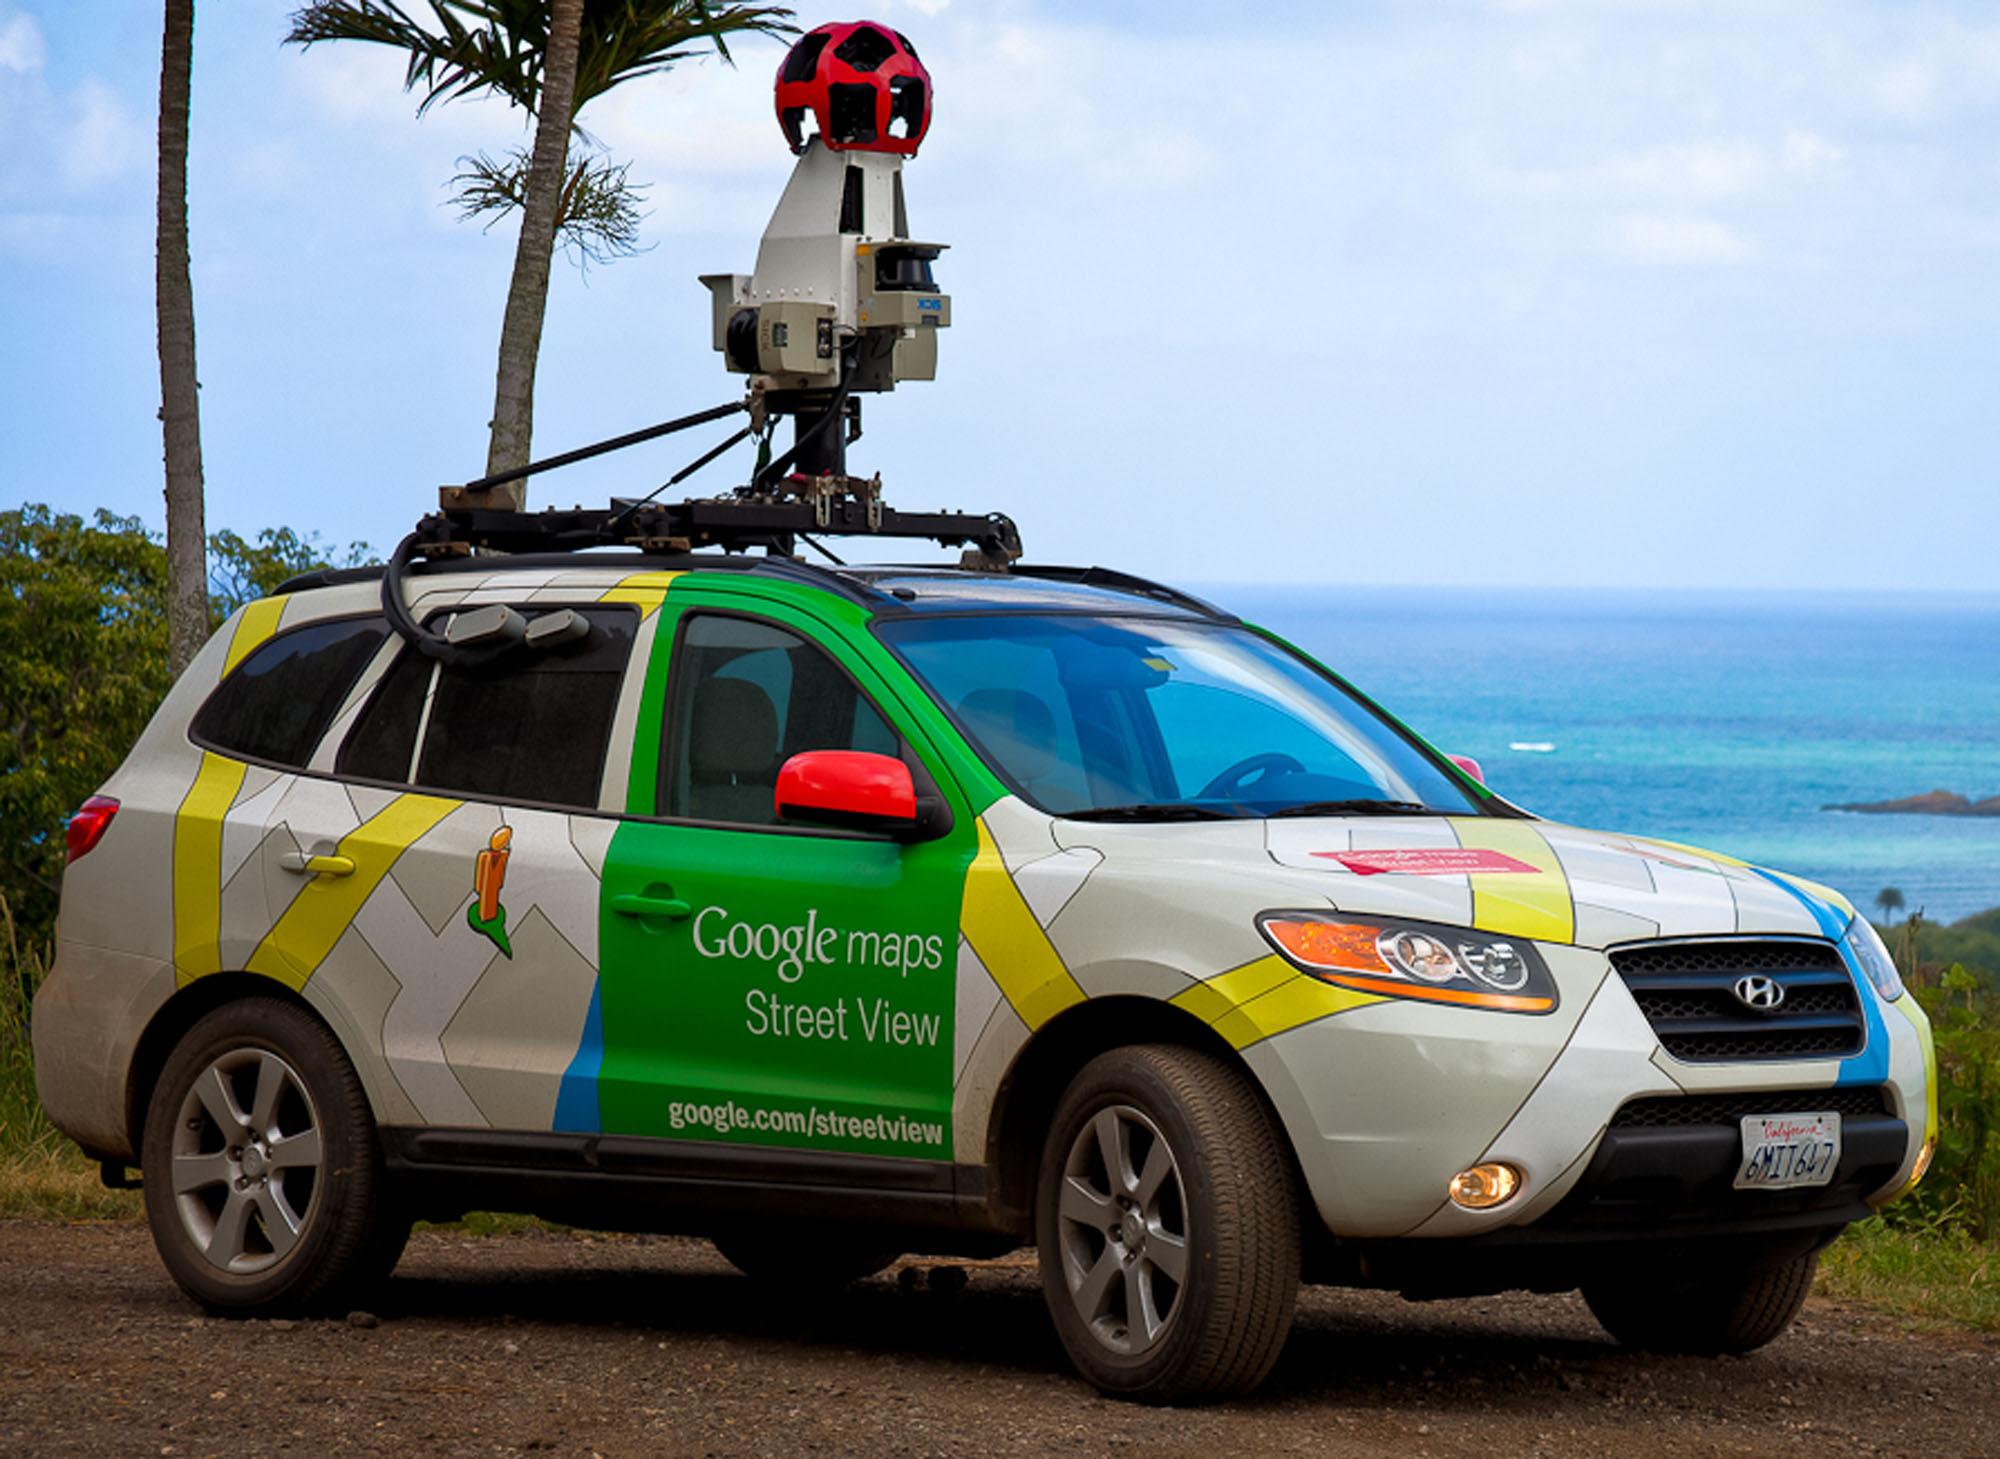 Guida autonoma e infortuni stradali